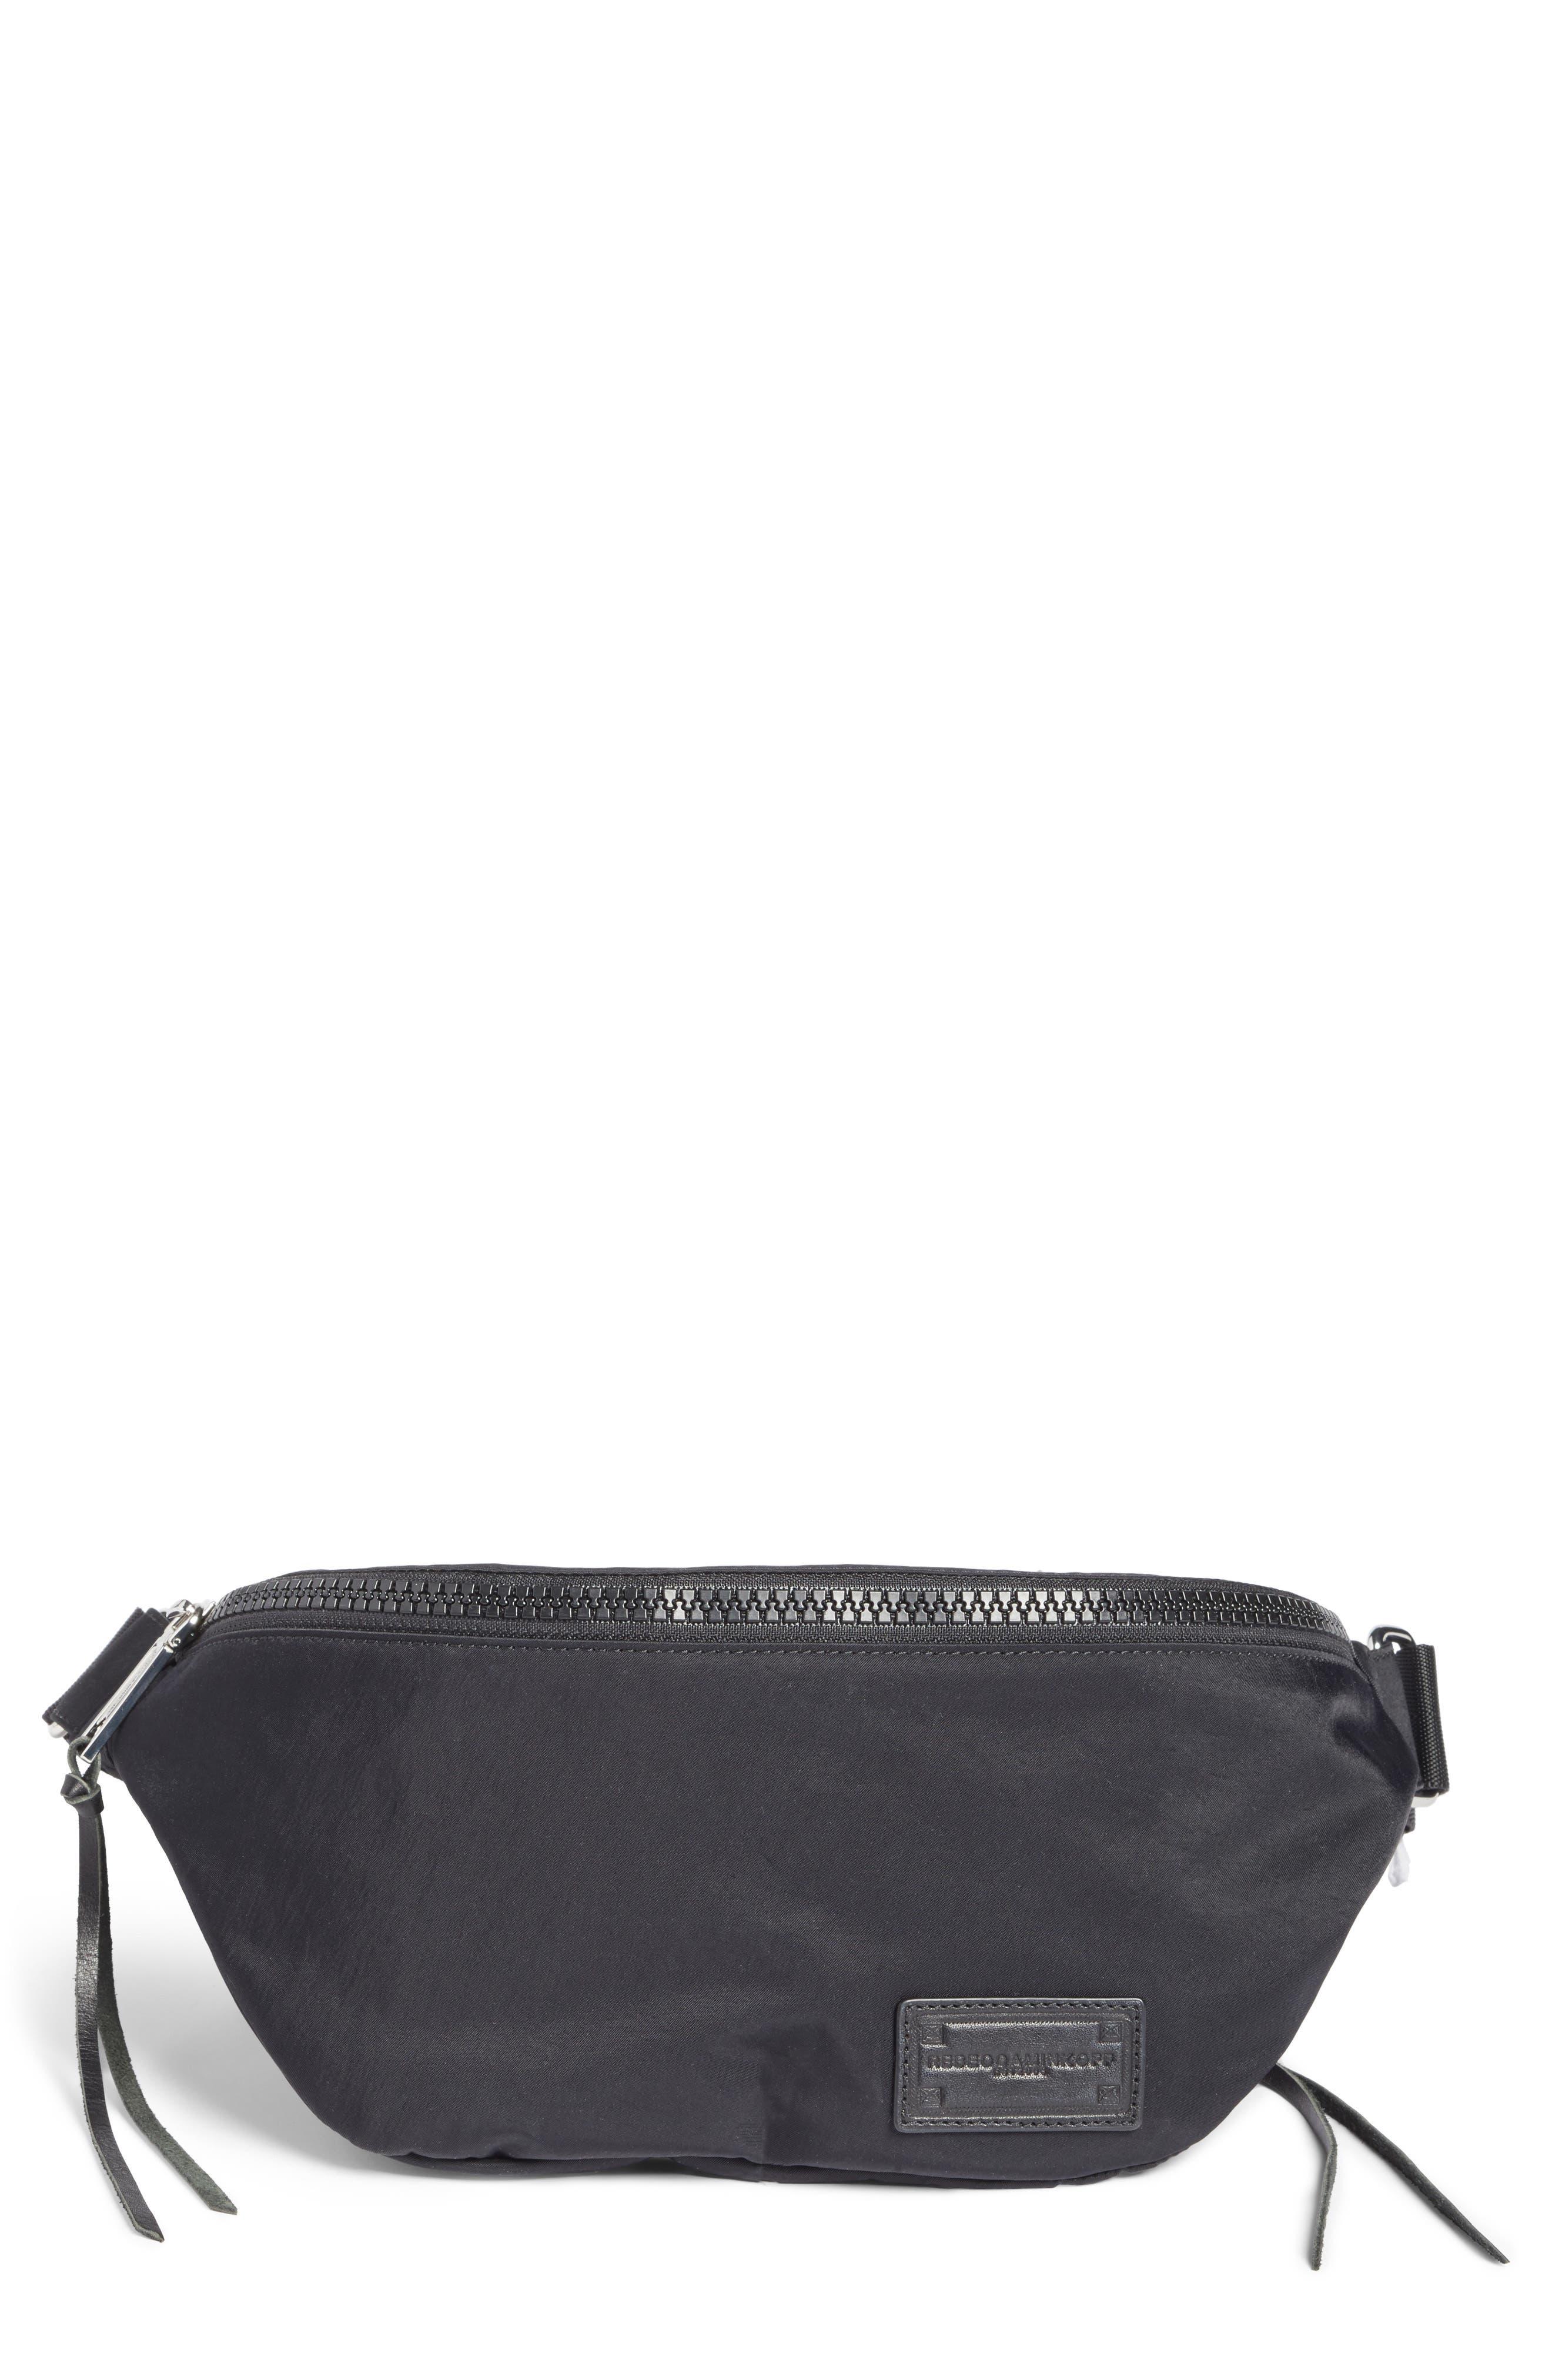 REBECCA MINKOFF Nylon Belt Bag, Main, color, BLACK